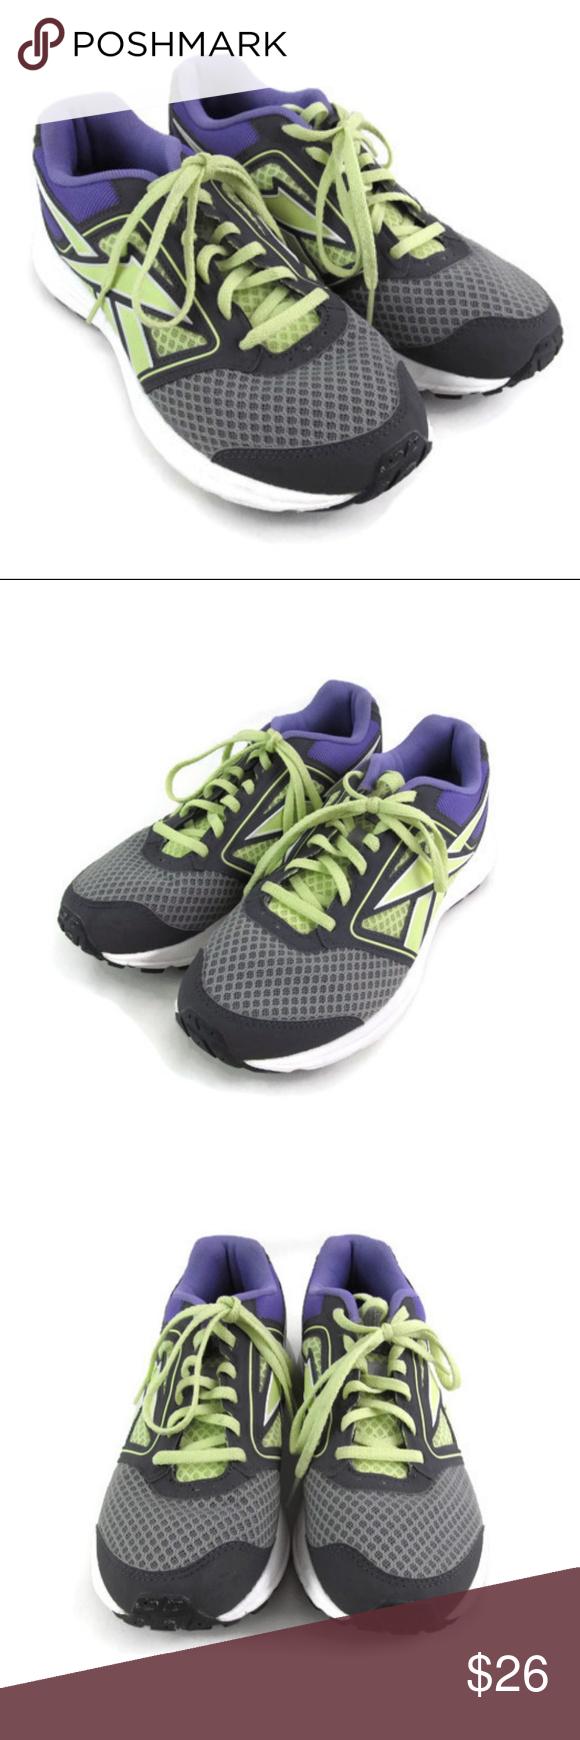 Reebok Memory Foam Running Shoes Reebok Women's Running